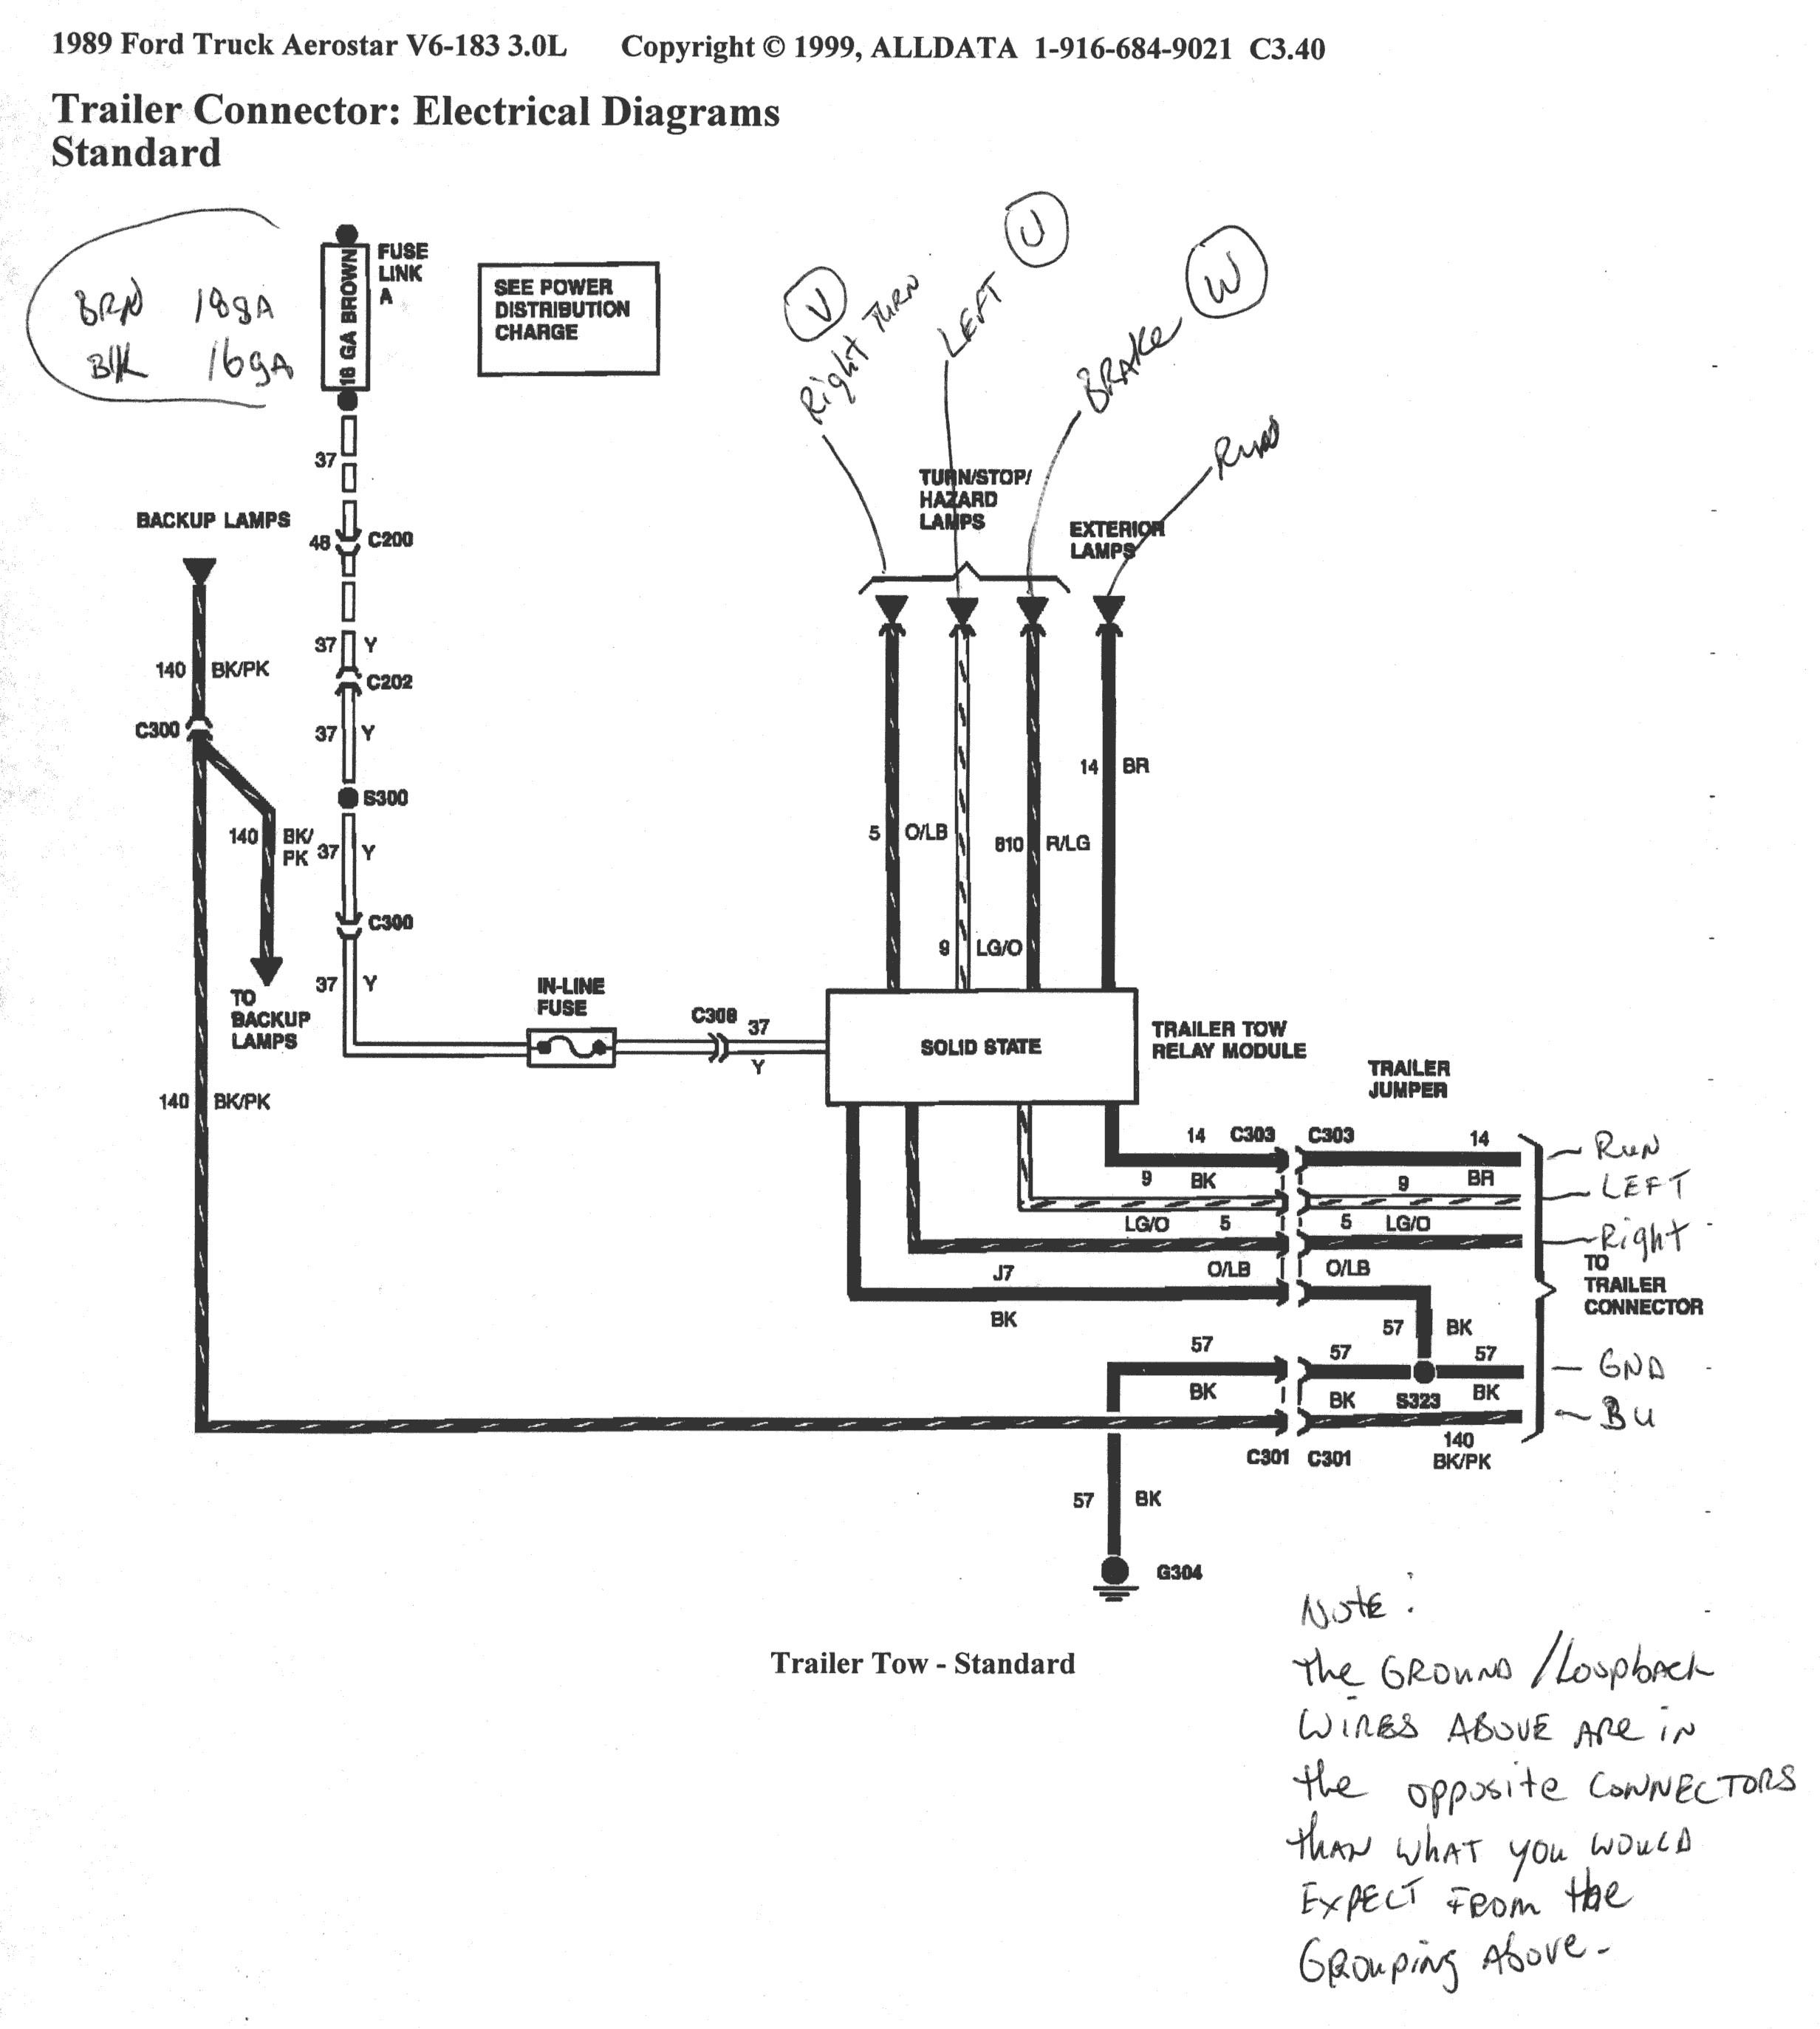 Enclosed Trailer Wiring Diagram Car Trailer Wiring Diagram Blurts Of Enclosed Trailer Wiring Diagram